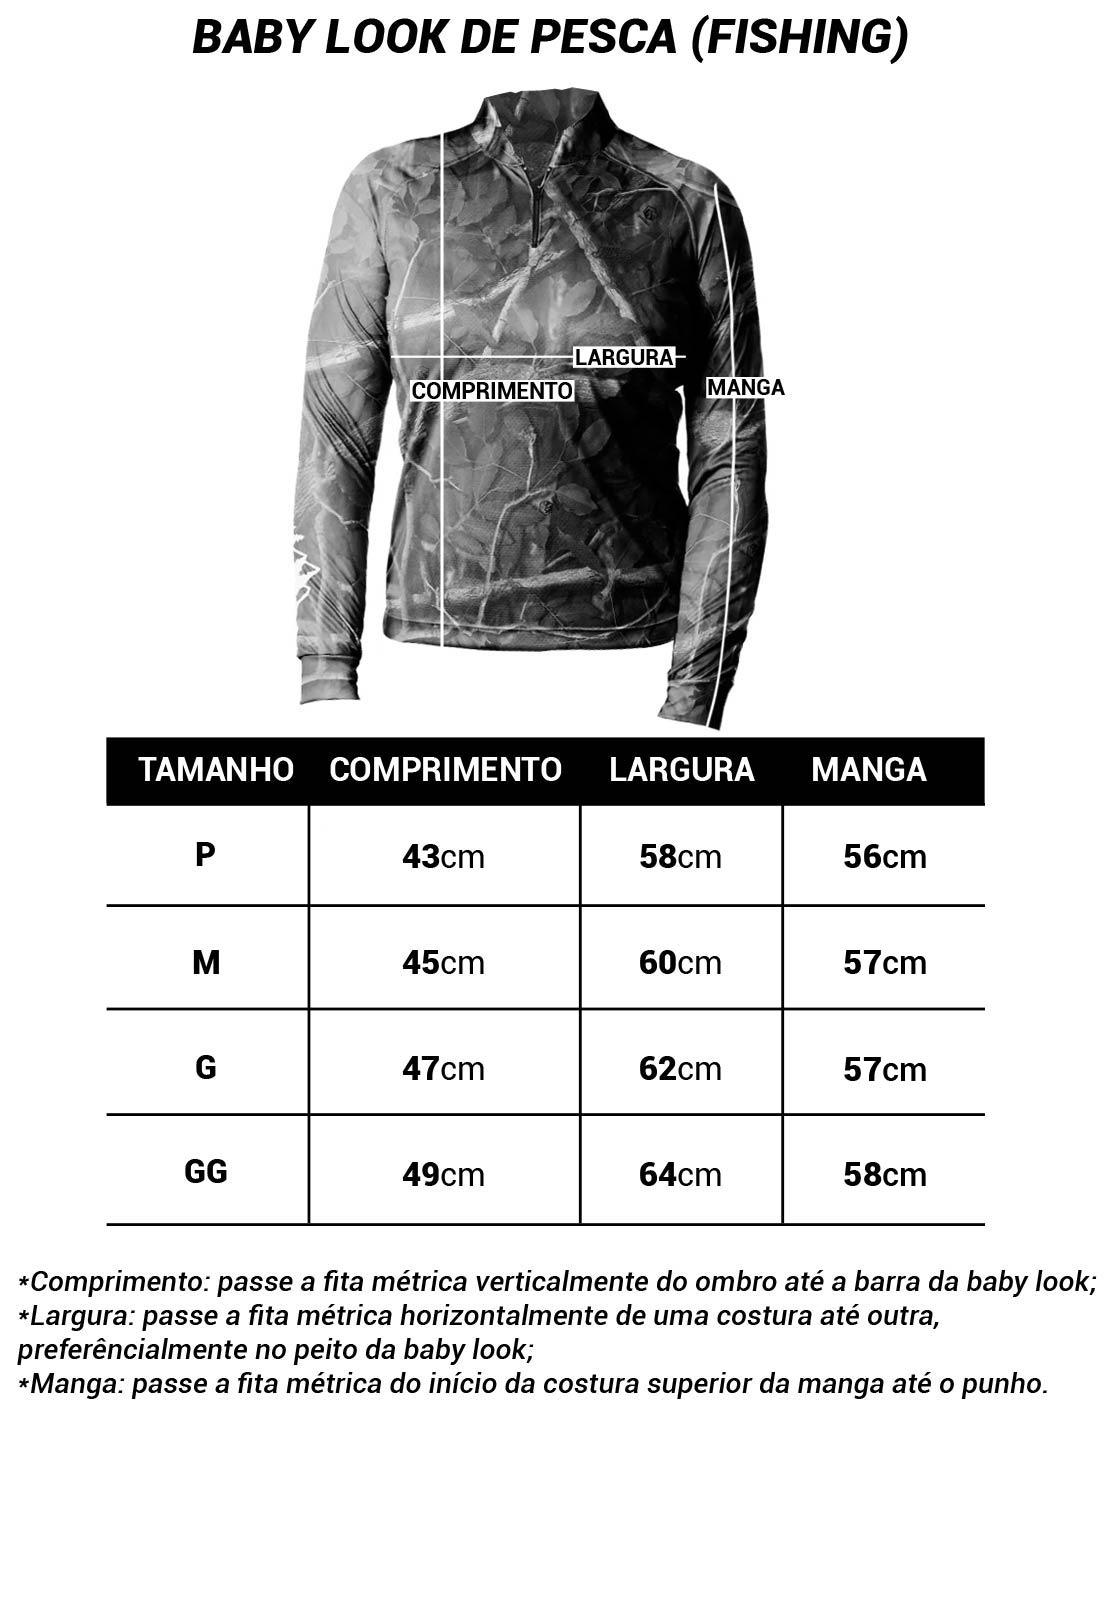 CAMISA DE PESCA FISH CAMUFLADA PRO 17 FEMININA + BANDANA GRÁTIS  - Real Hunter